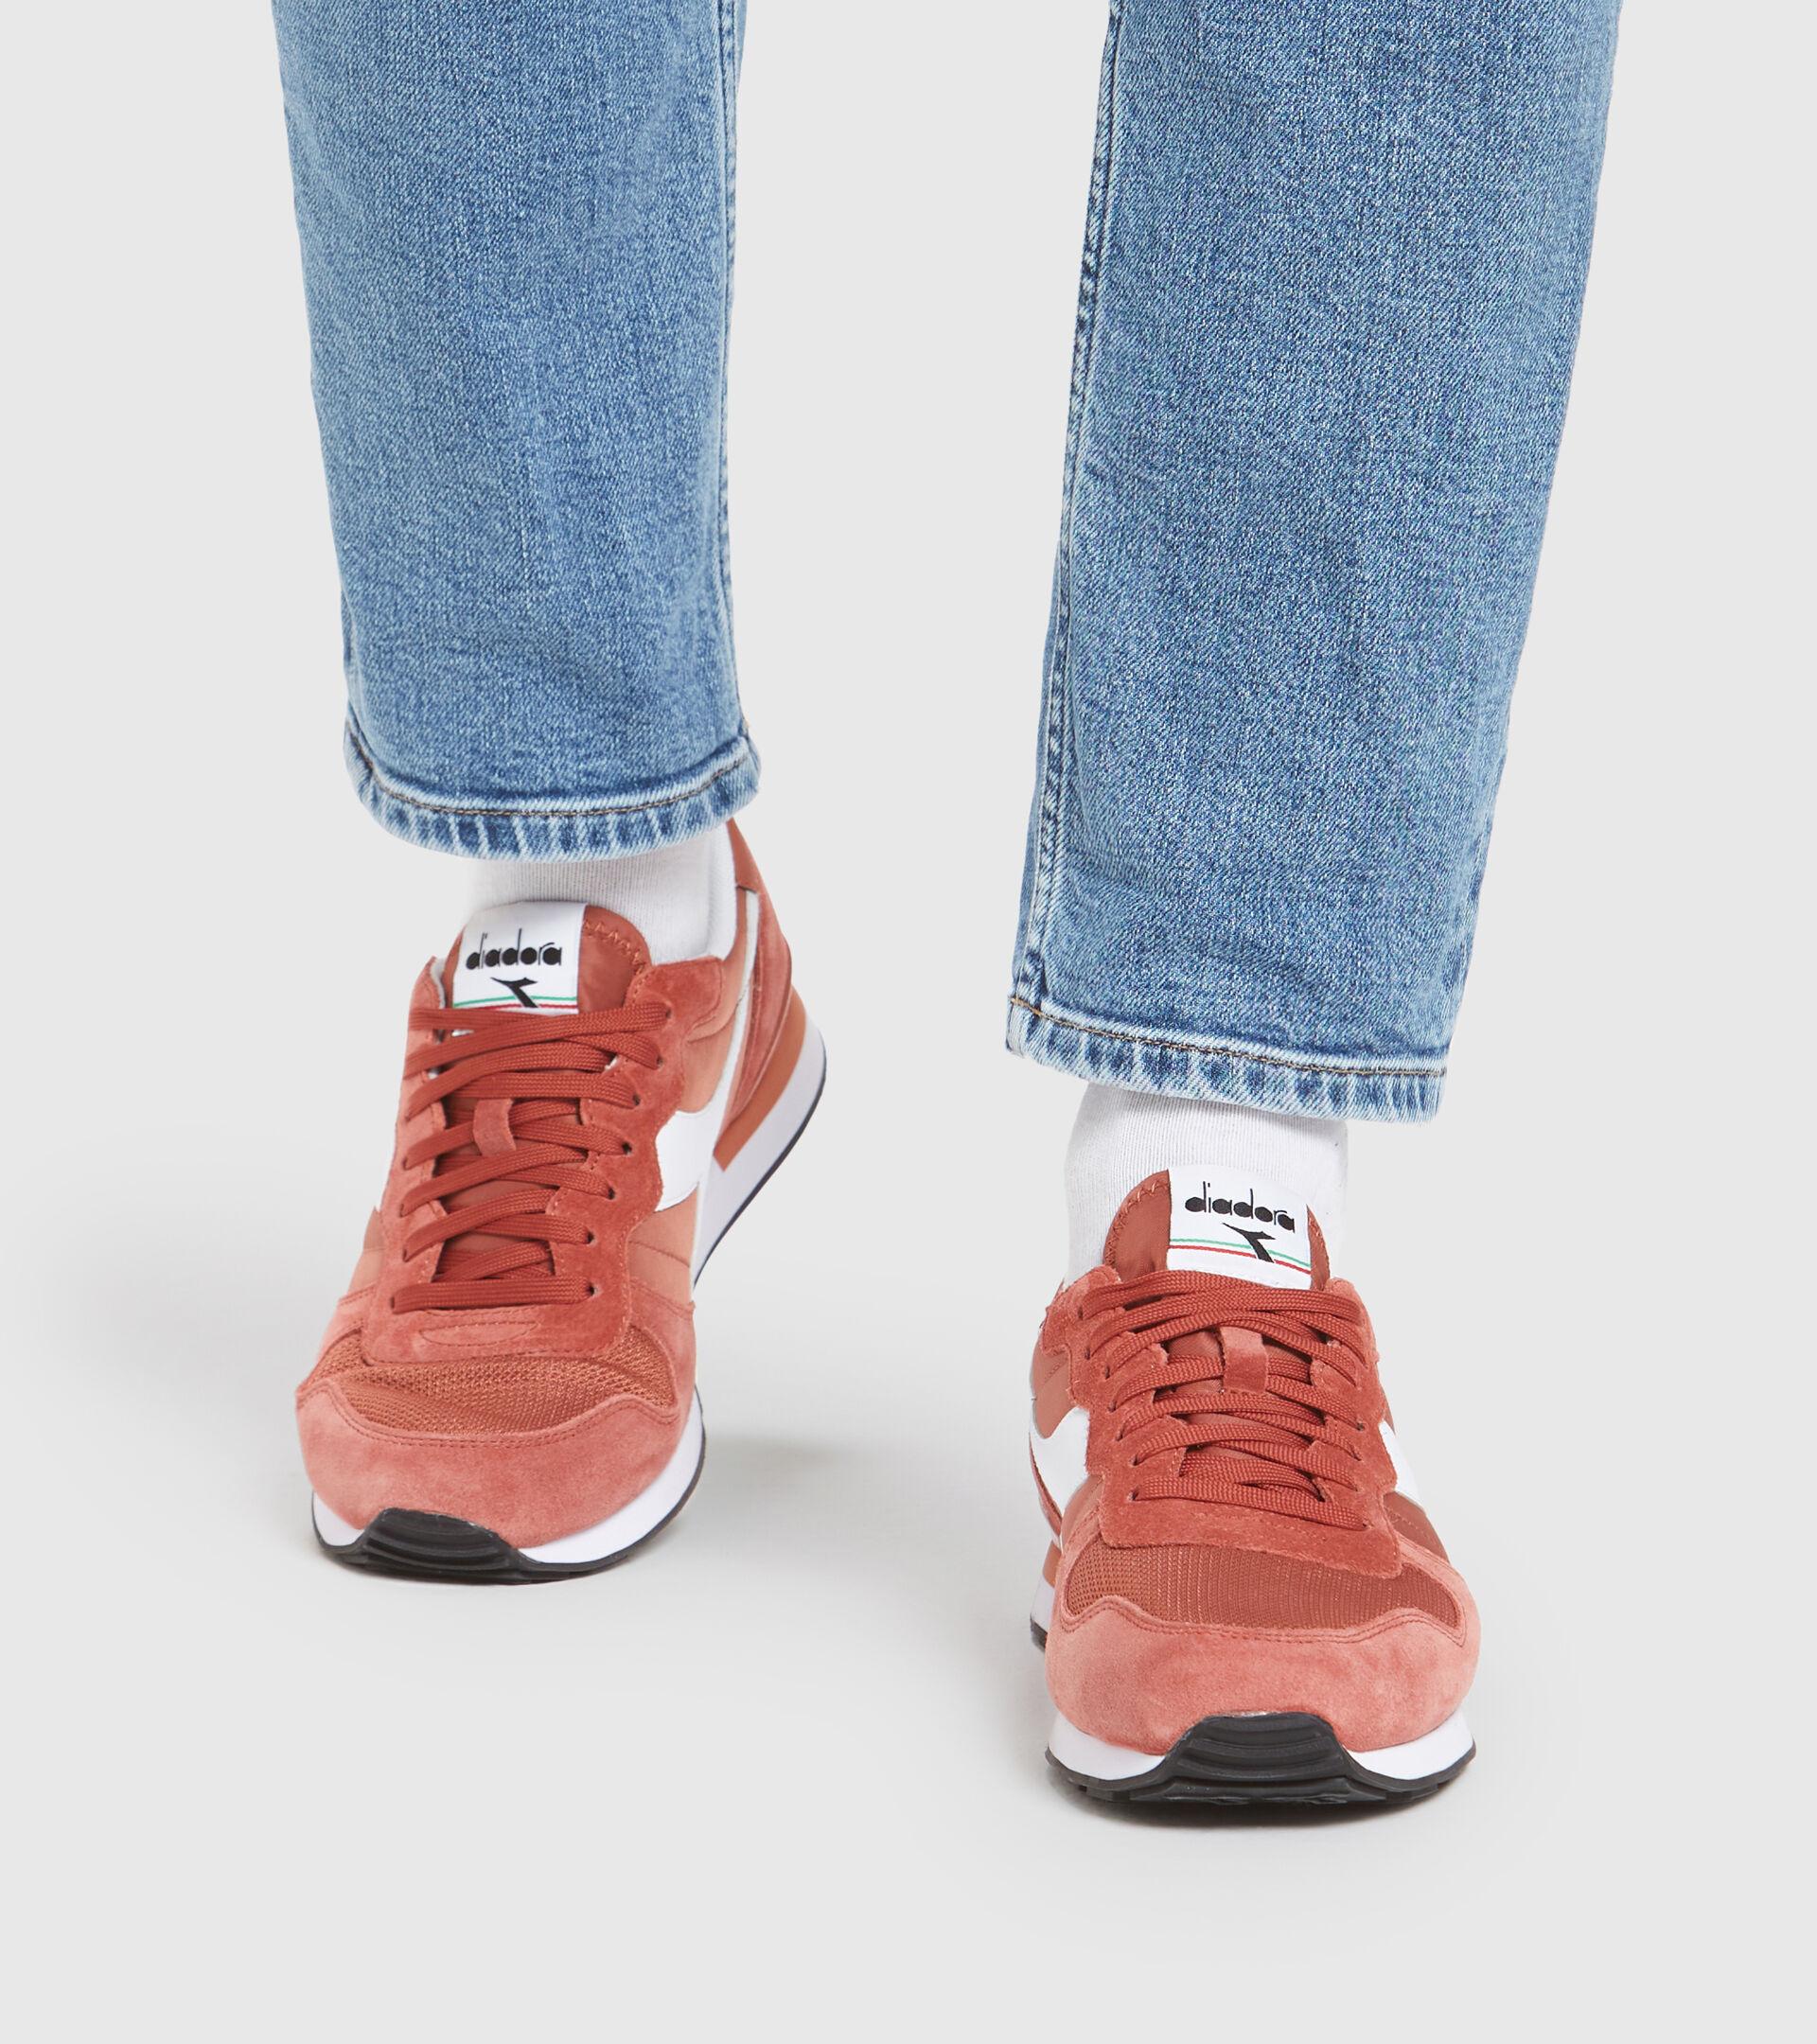 Footwear Sportswear UNISEX CAMARO MARRONE TABASCO Diadora